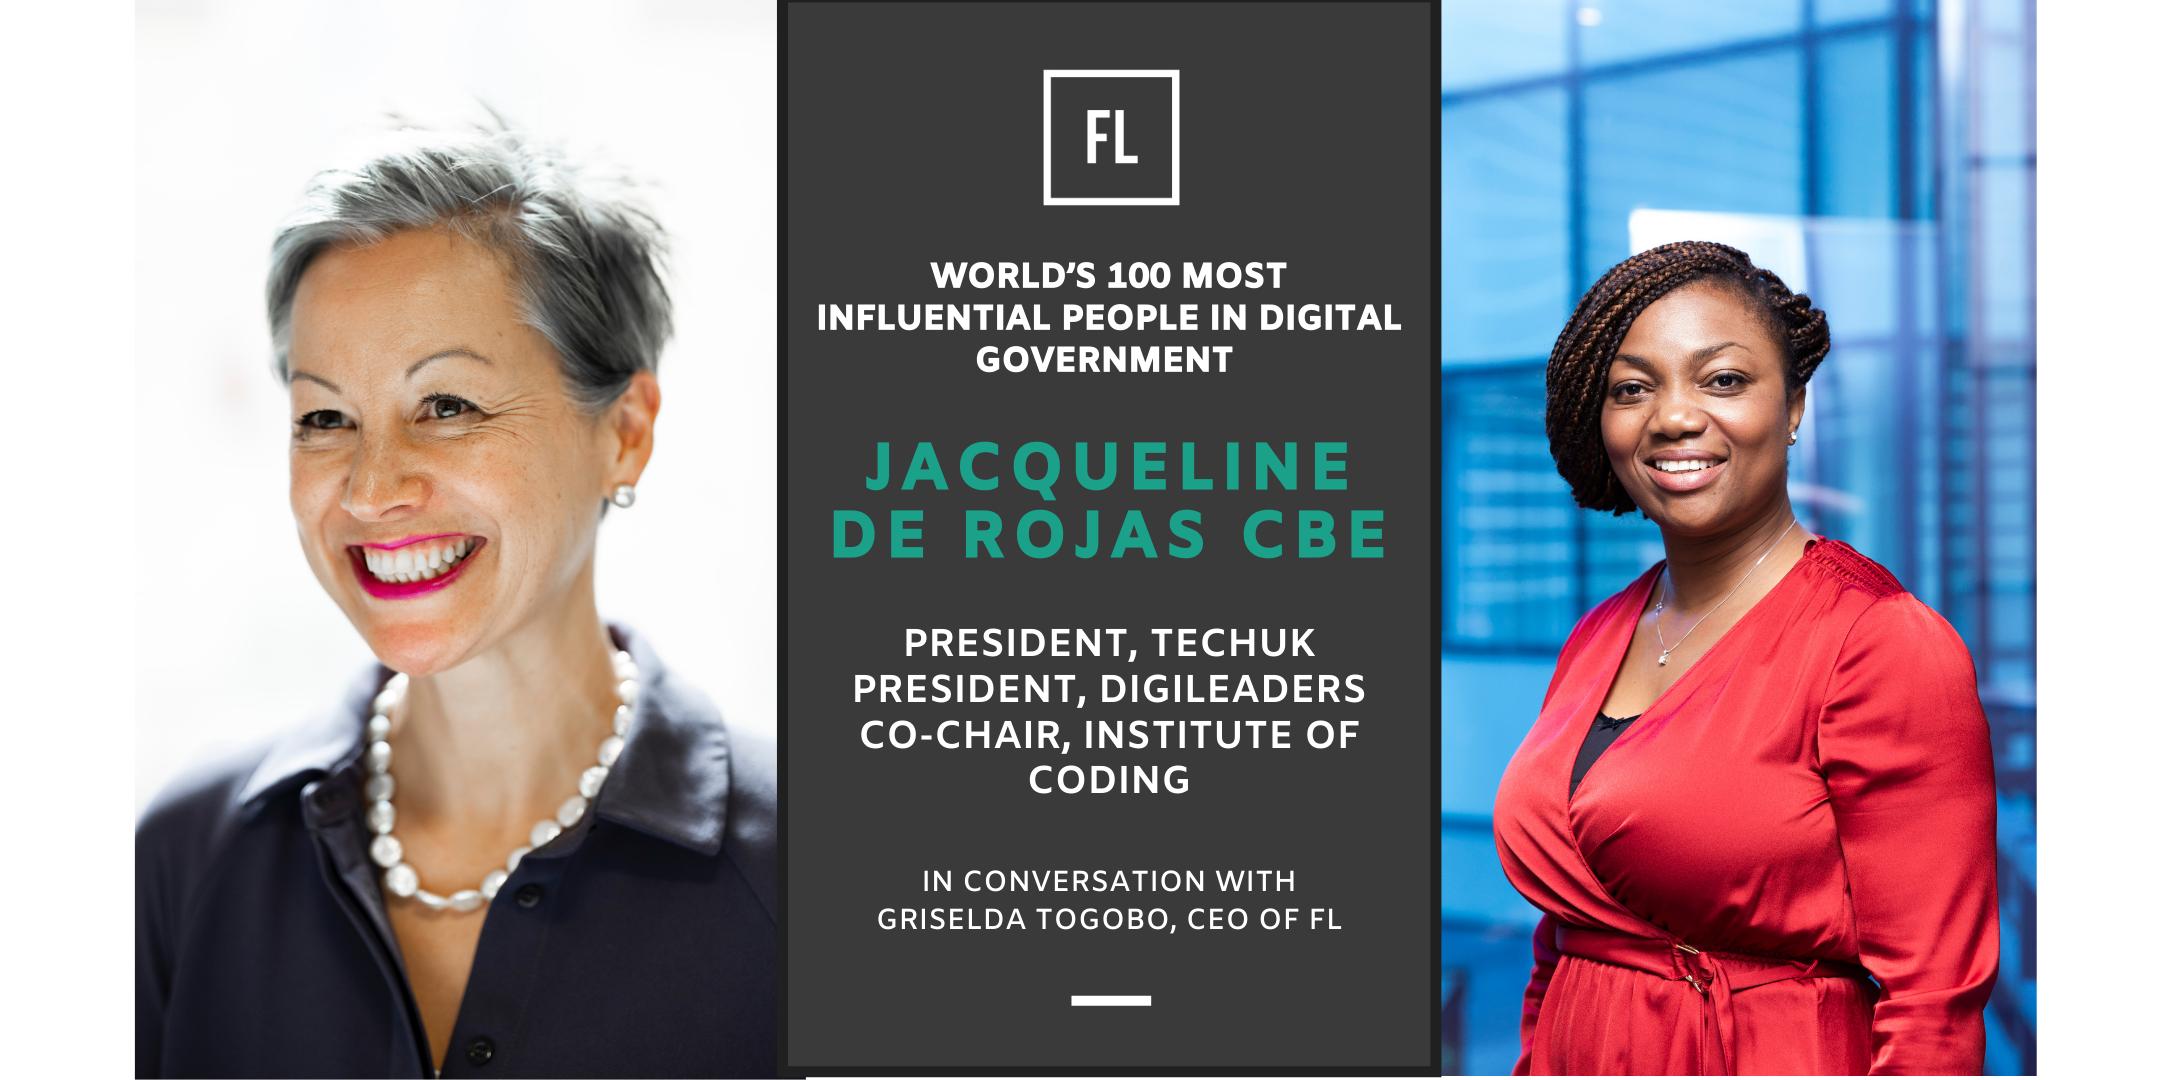 In Conversation With Jacqueline de Rojas CBE, President TechUK